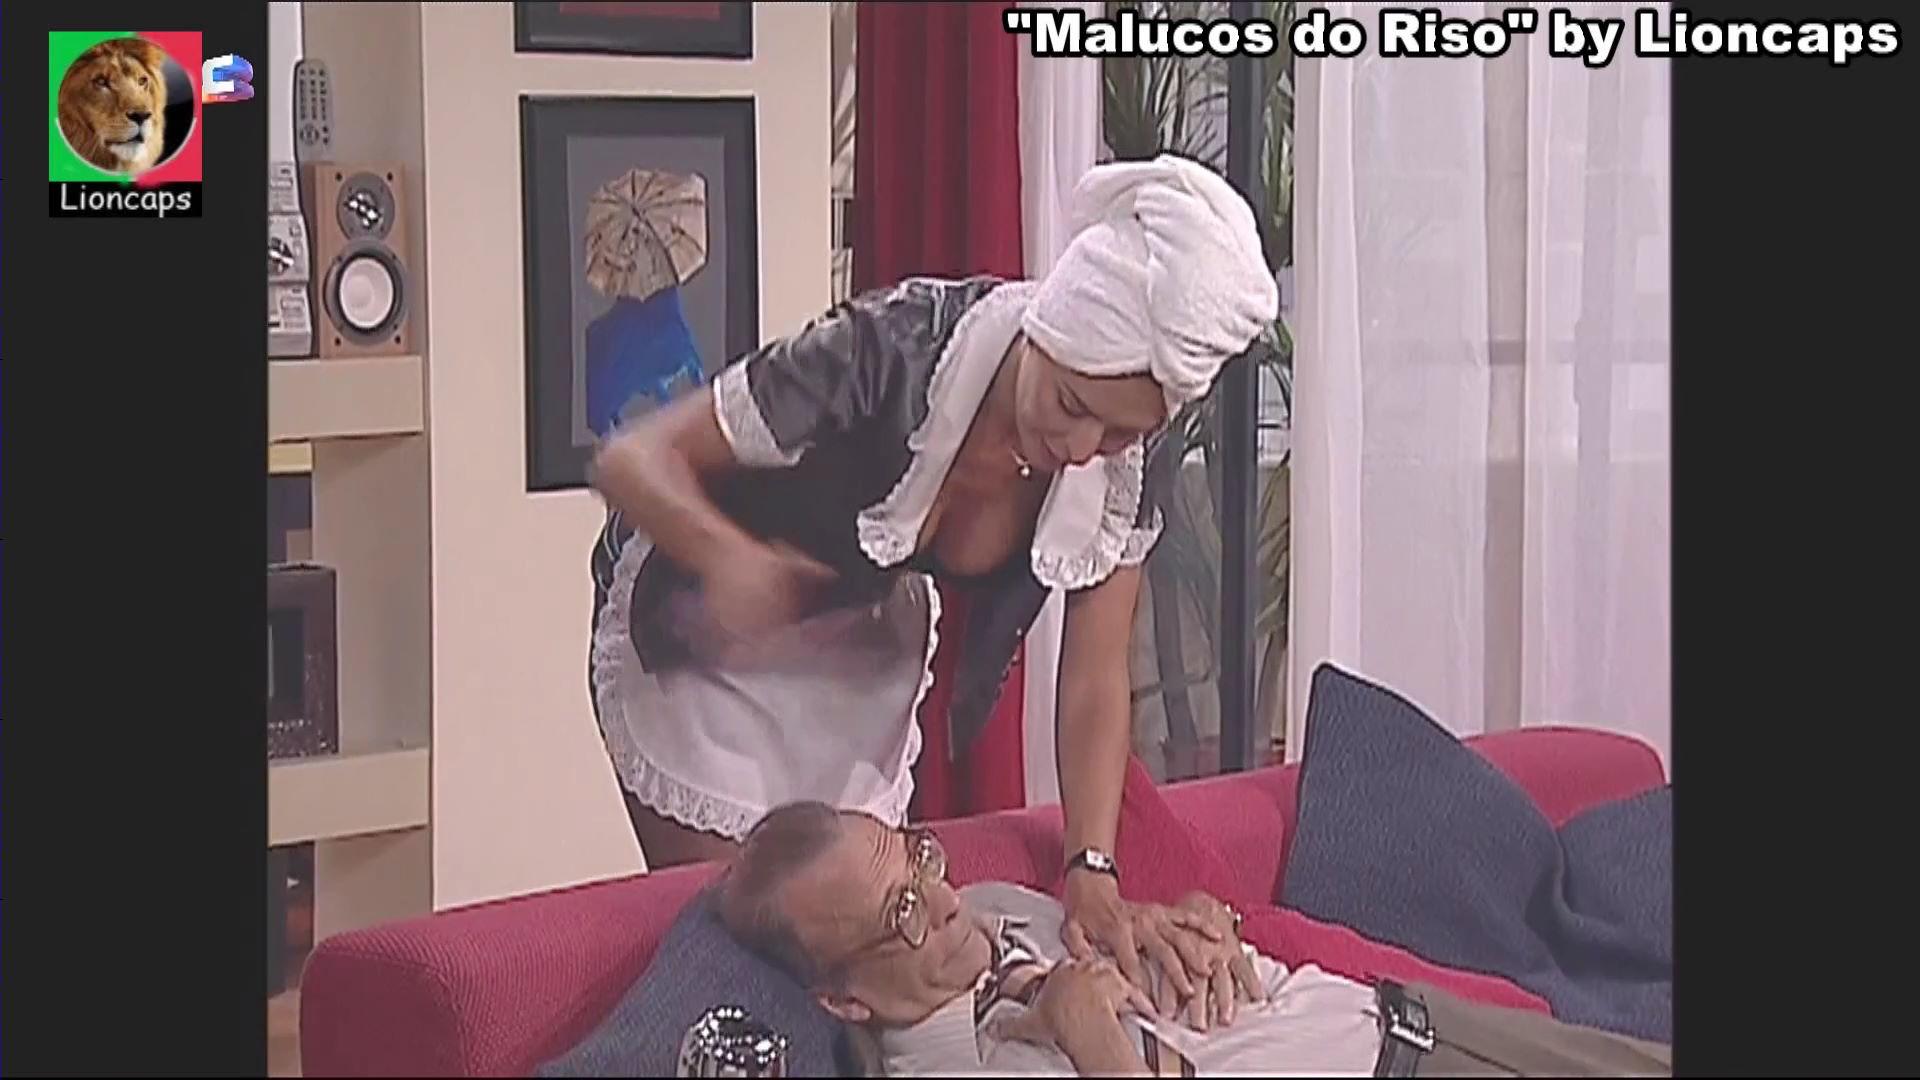 475182815_malucos_riso_alda_gomes_vs190malucos_riso_602_15085_122_340lo.JPG